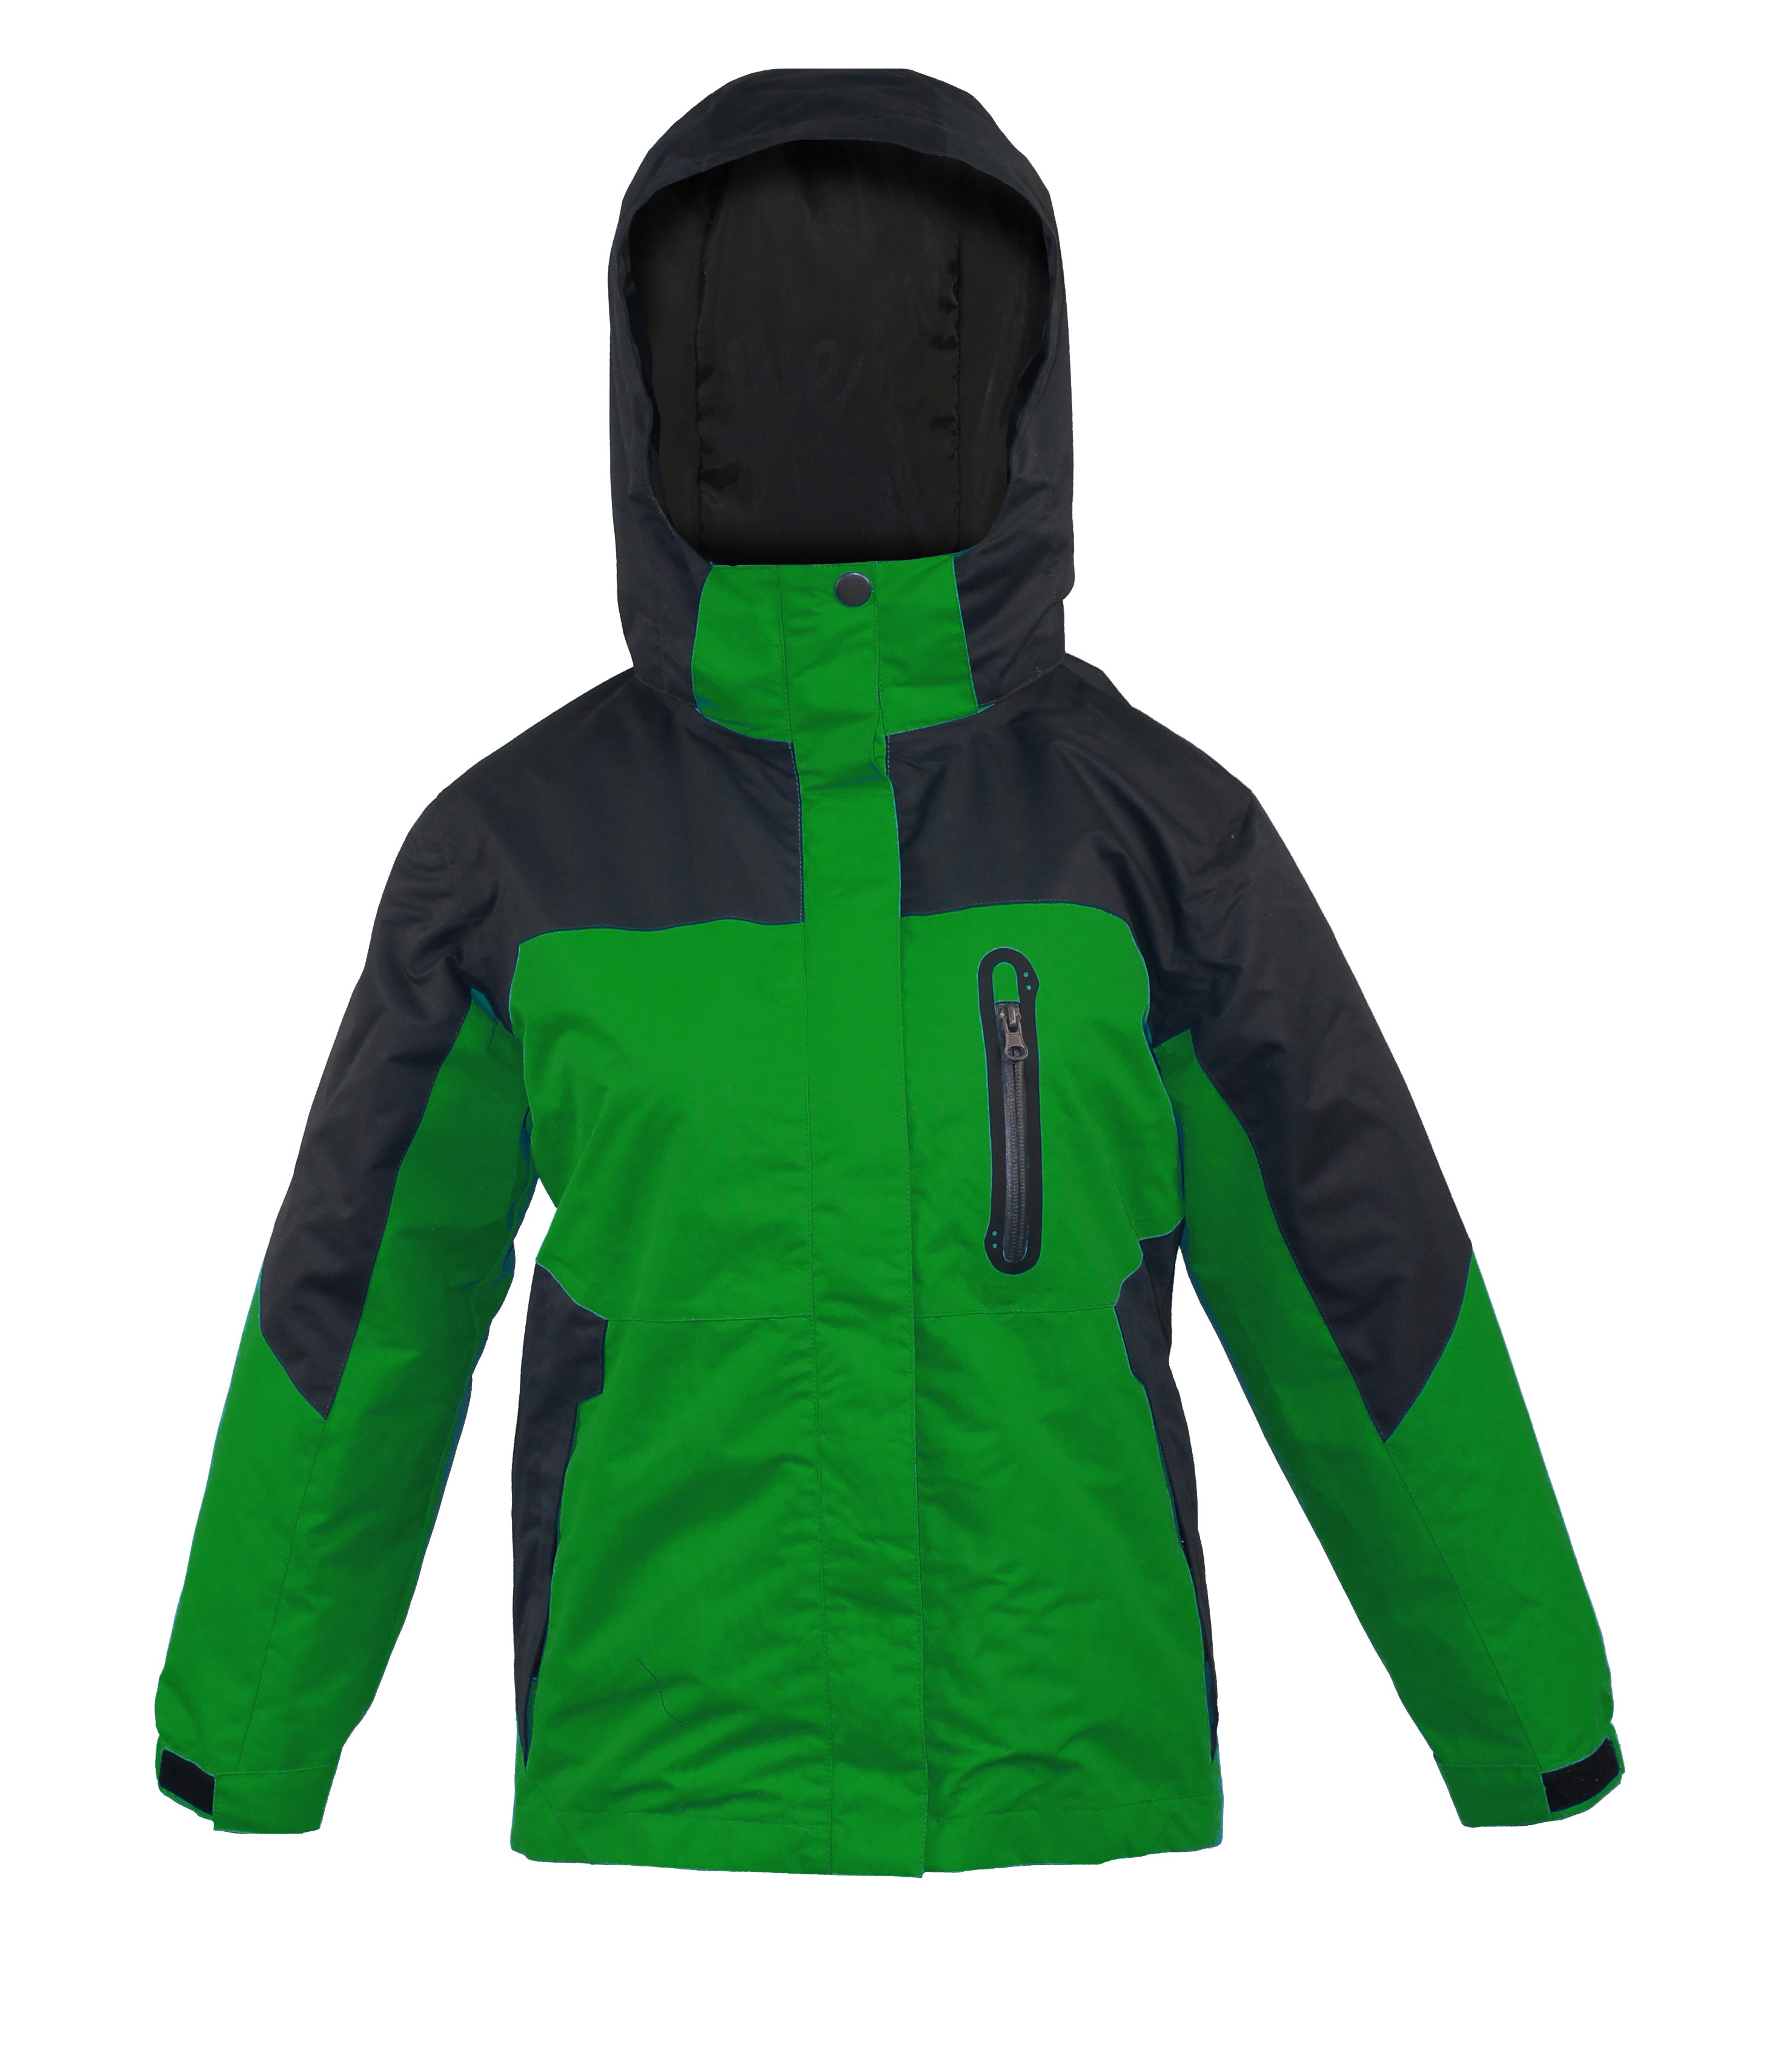 New Pulse Boy's Yukon Winter Ski Snowboard Jacket | eBay